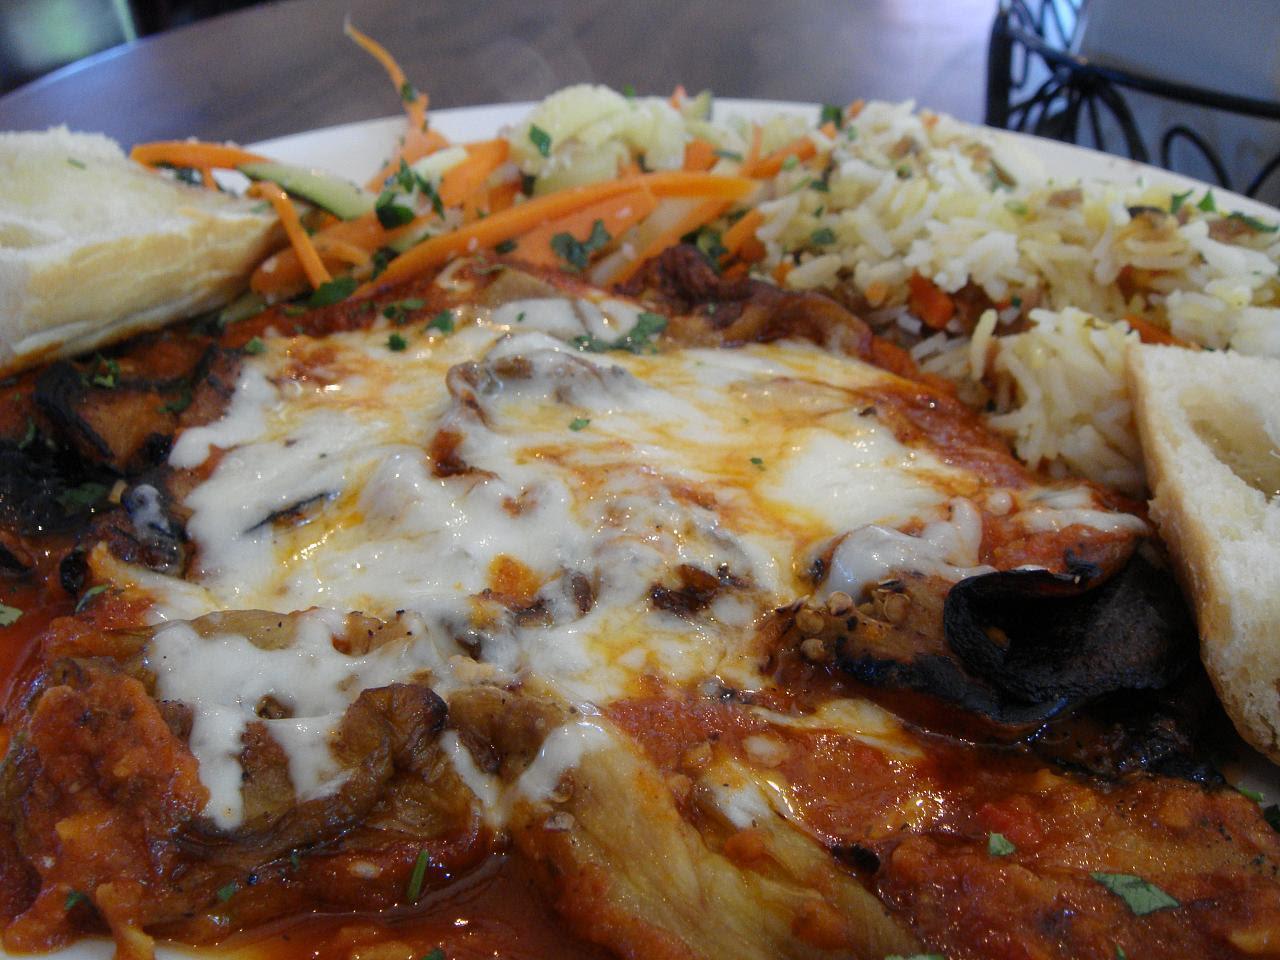 Eggplant Parmesan close-up